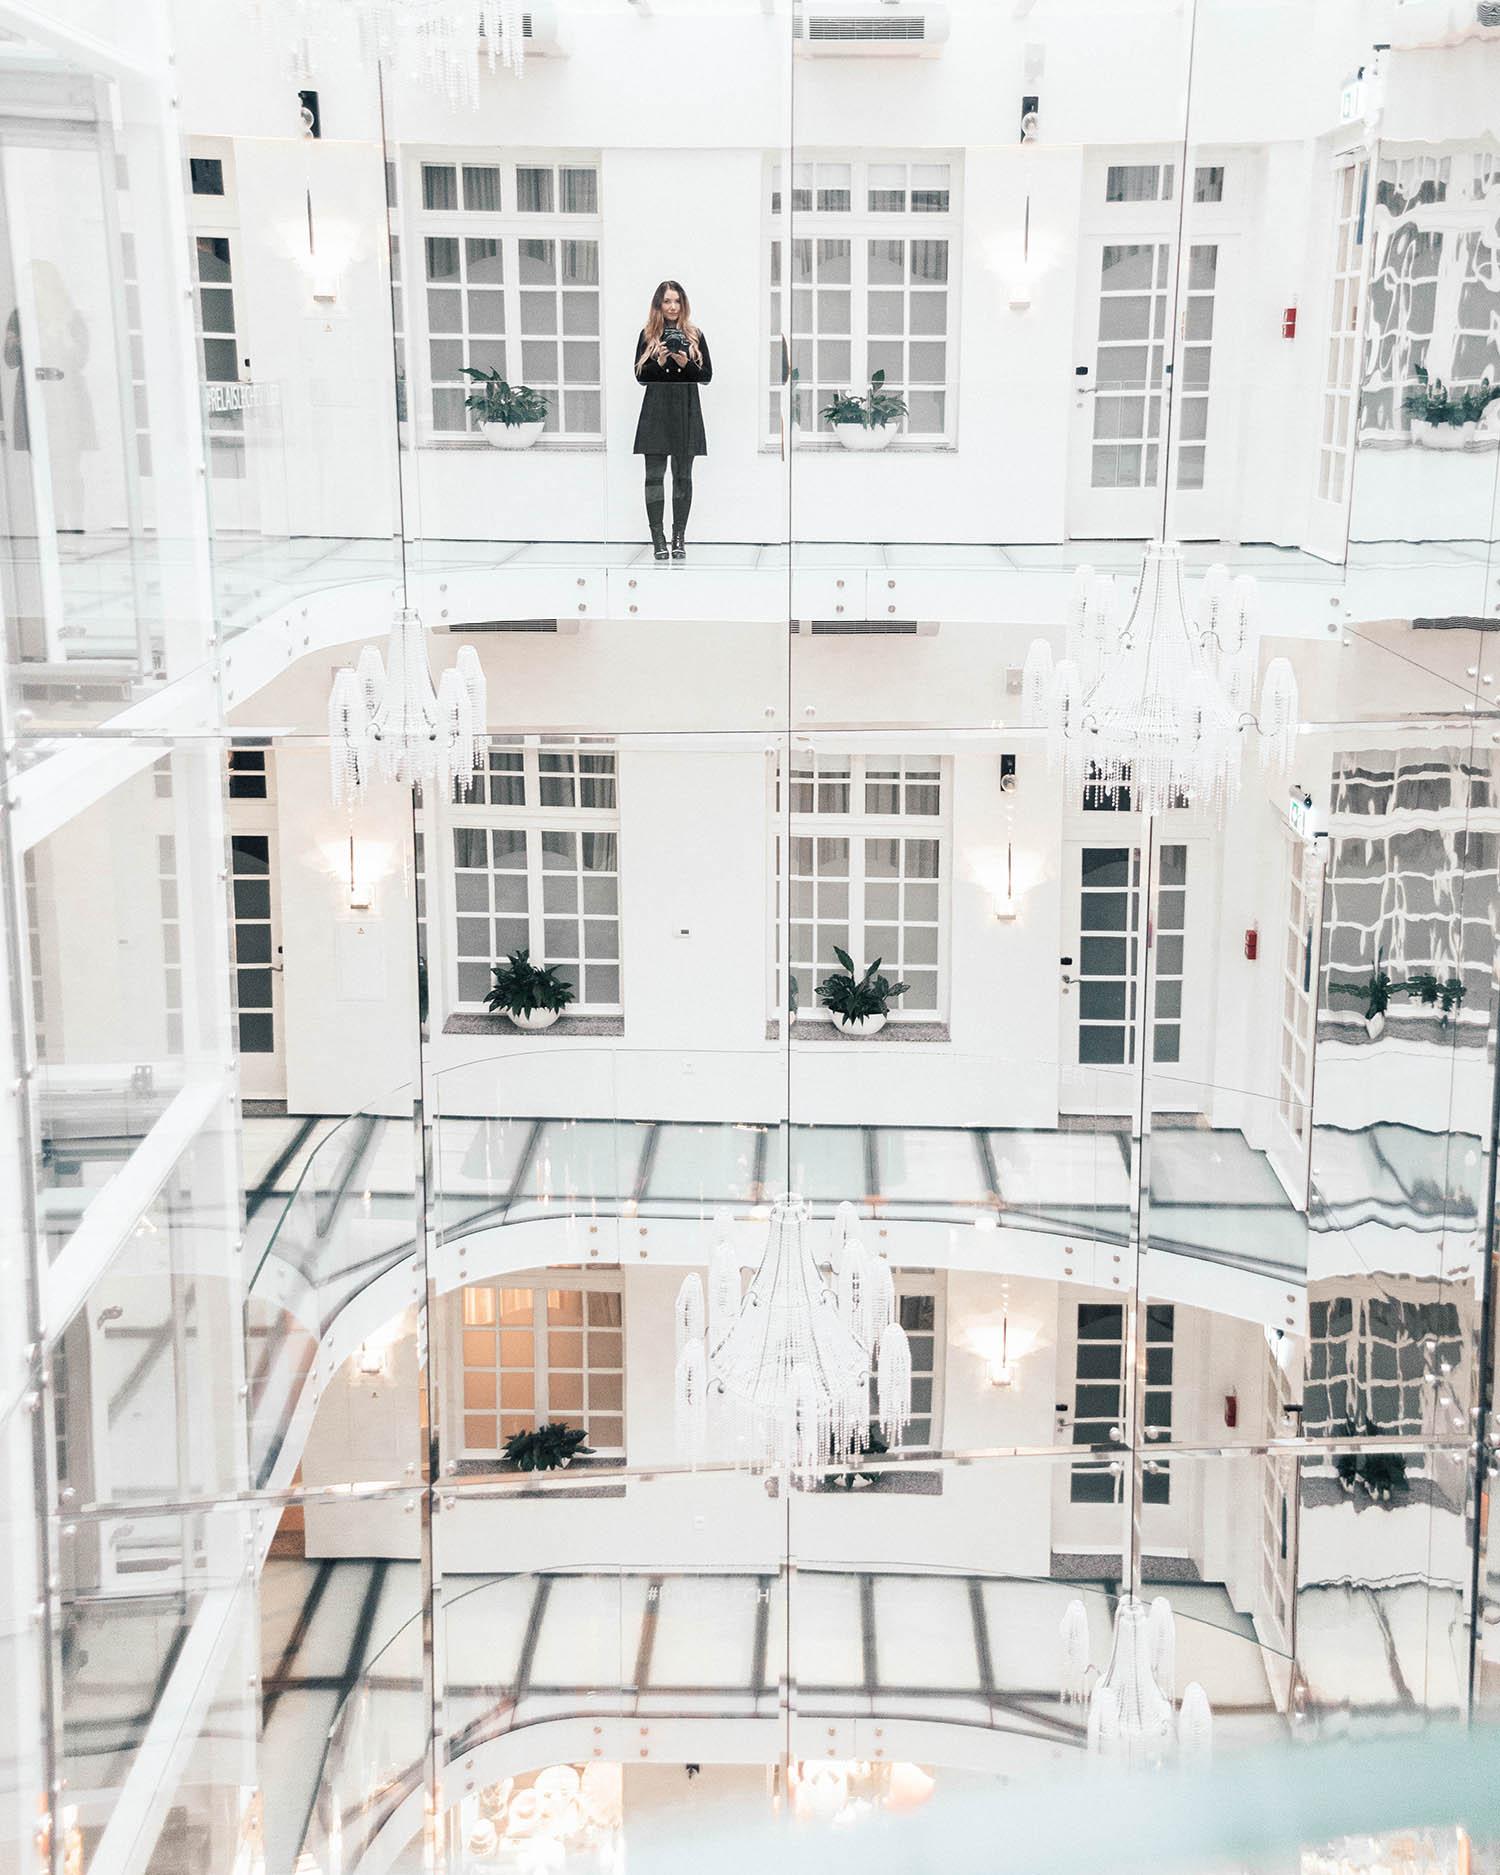 ADARAS in the beautiful Hotel Le Chevalier Relais in Riga, Latvia